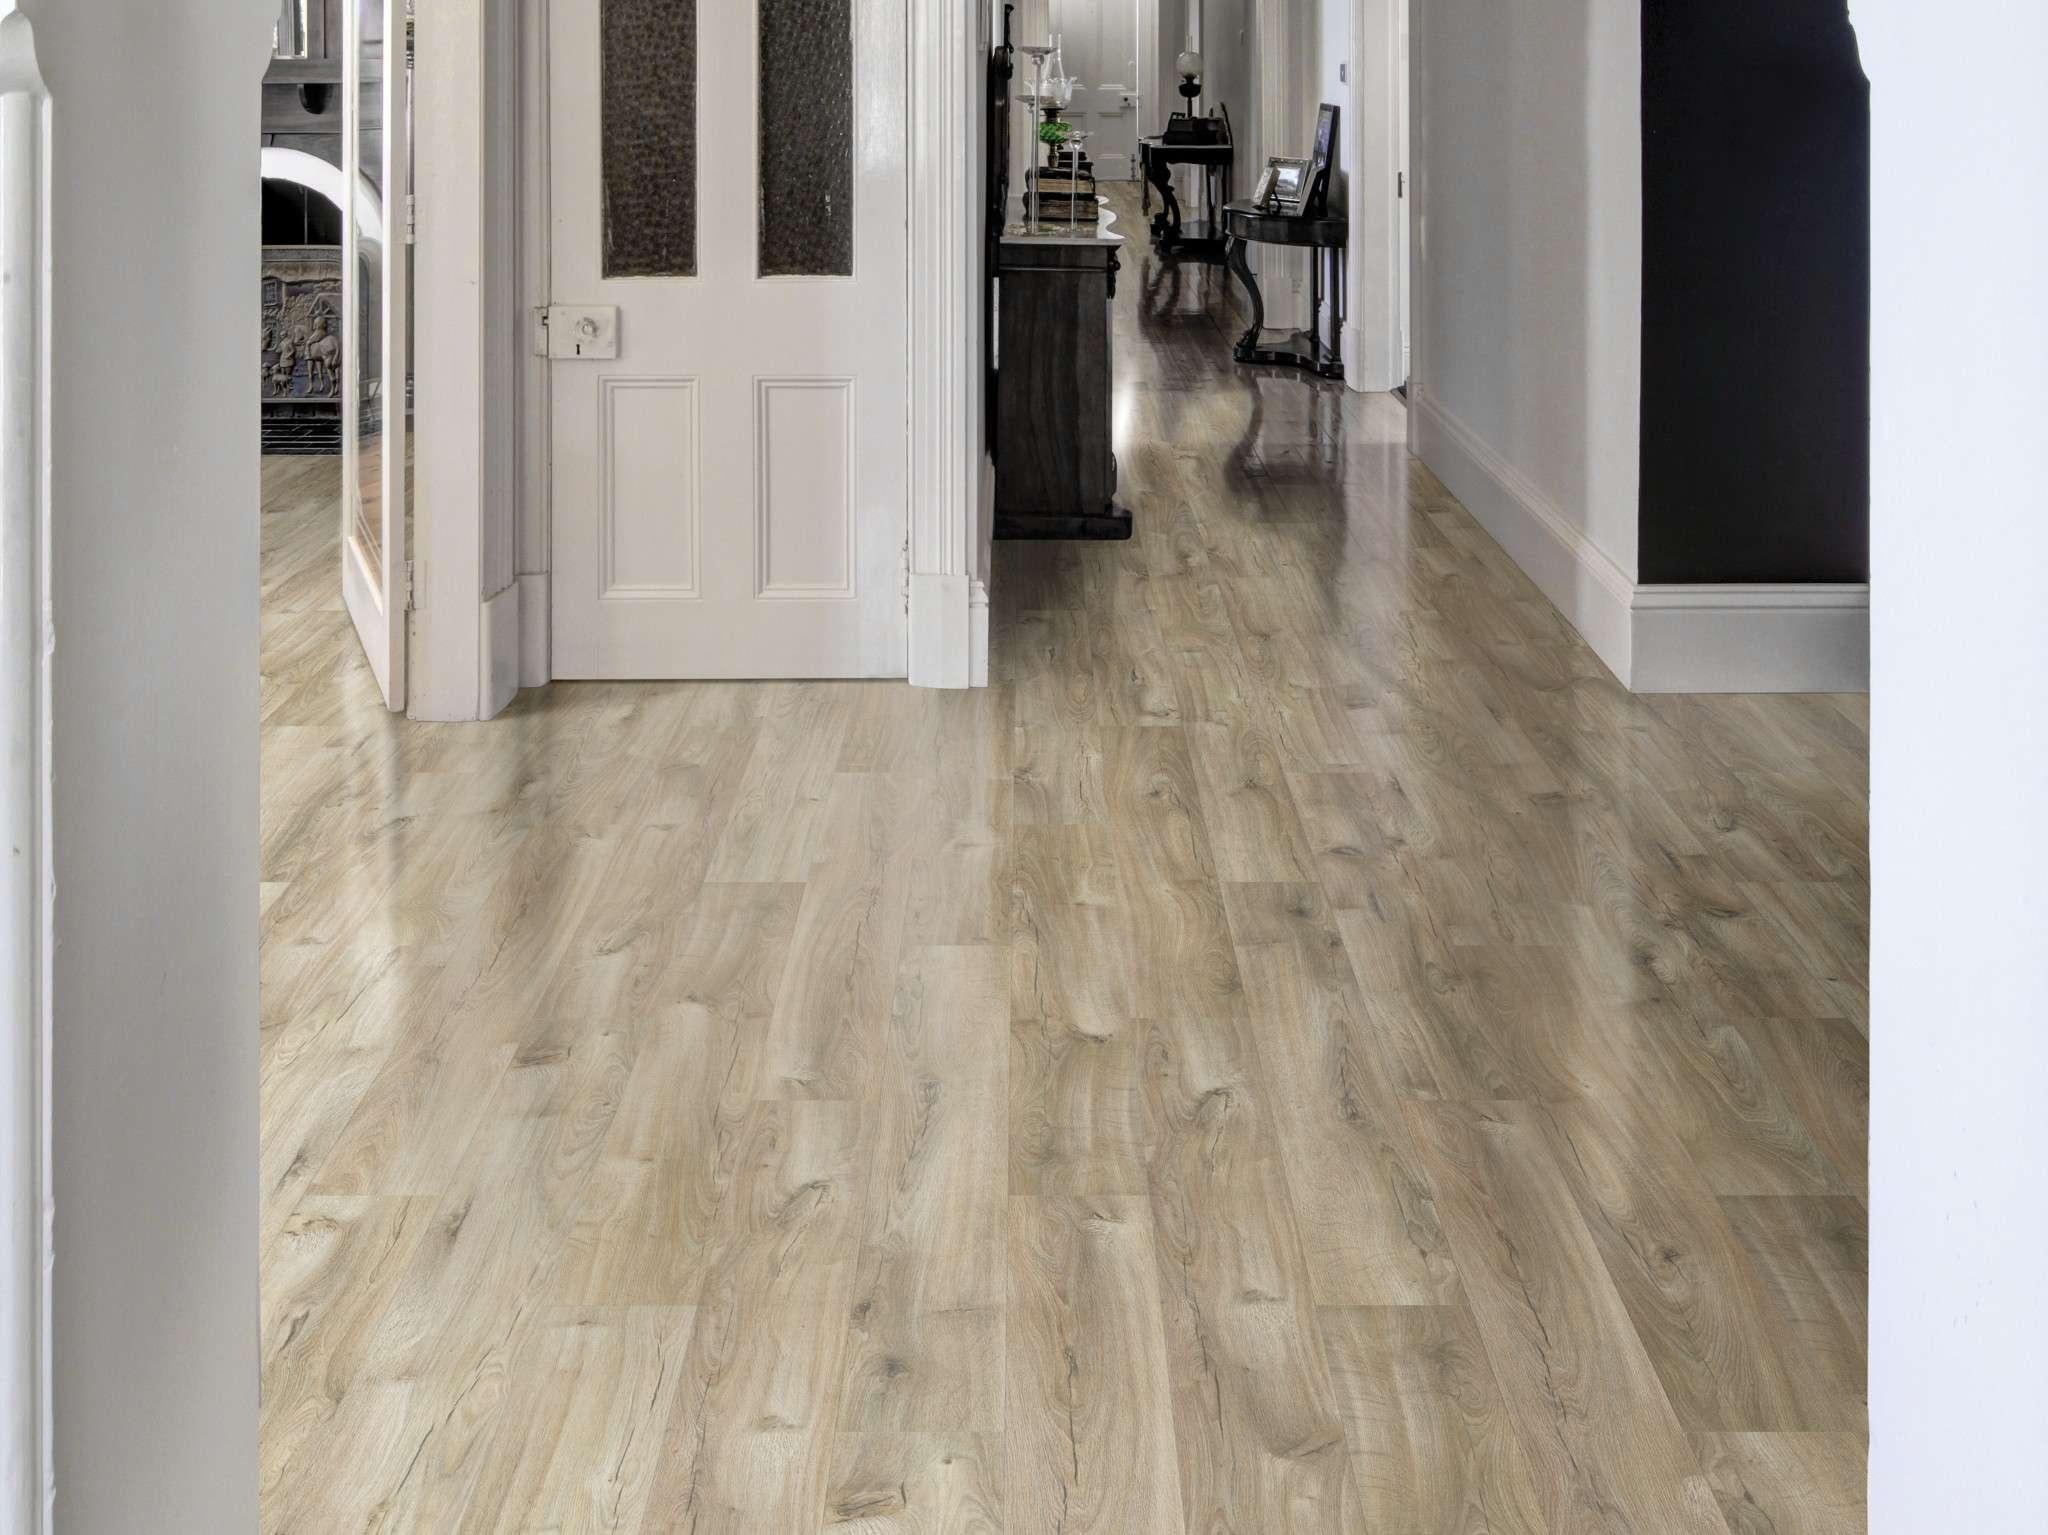 Illumination Sl431 Twilight Laminates, Shaw Tile Look Laminate Flooring